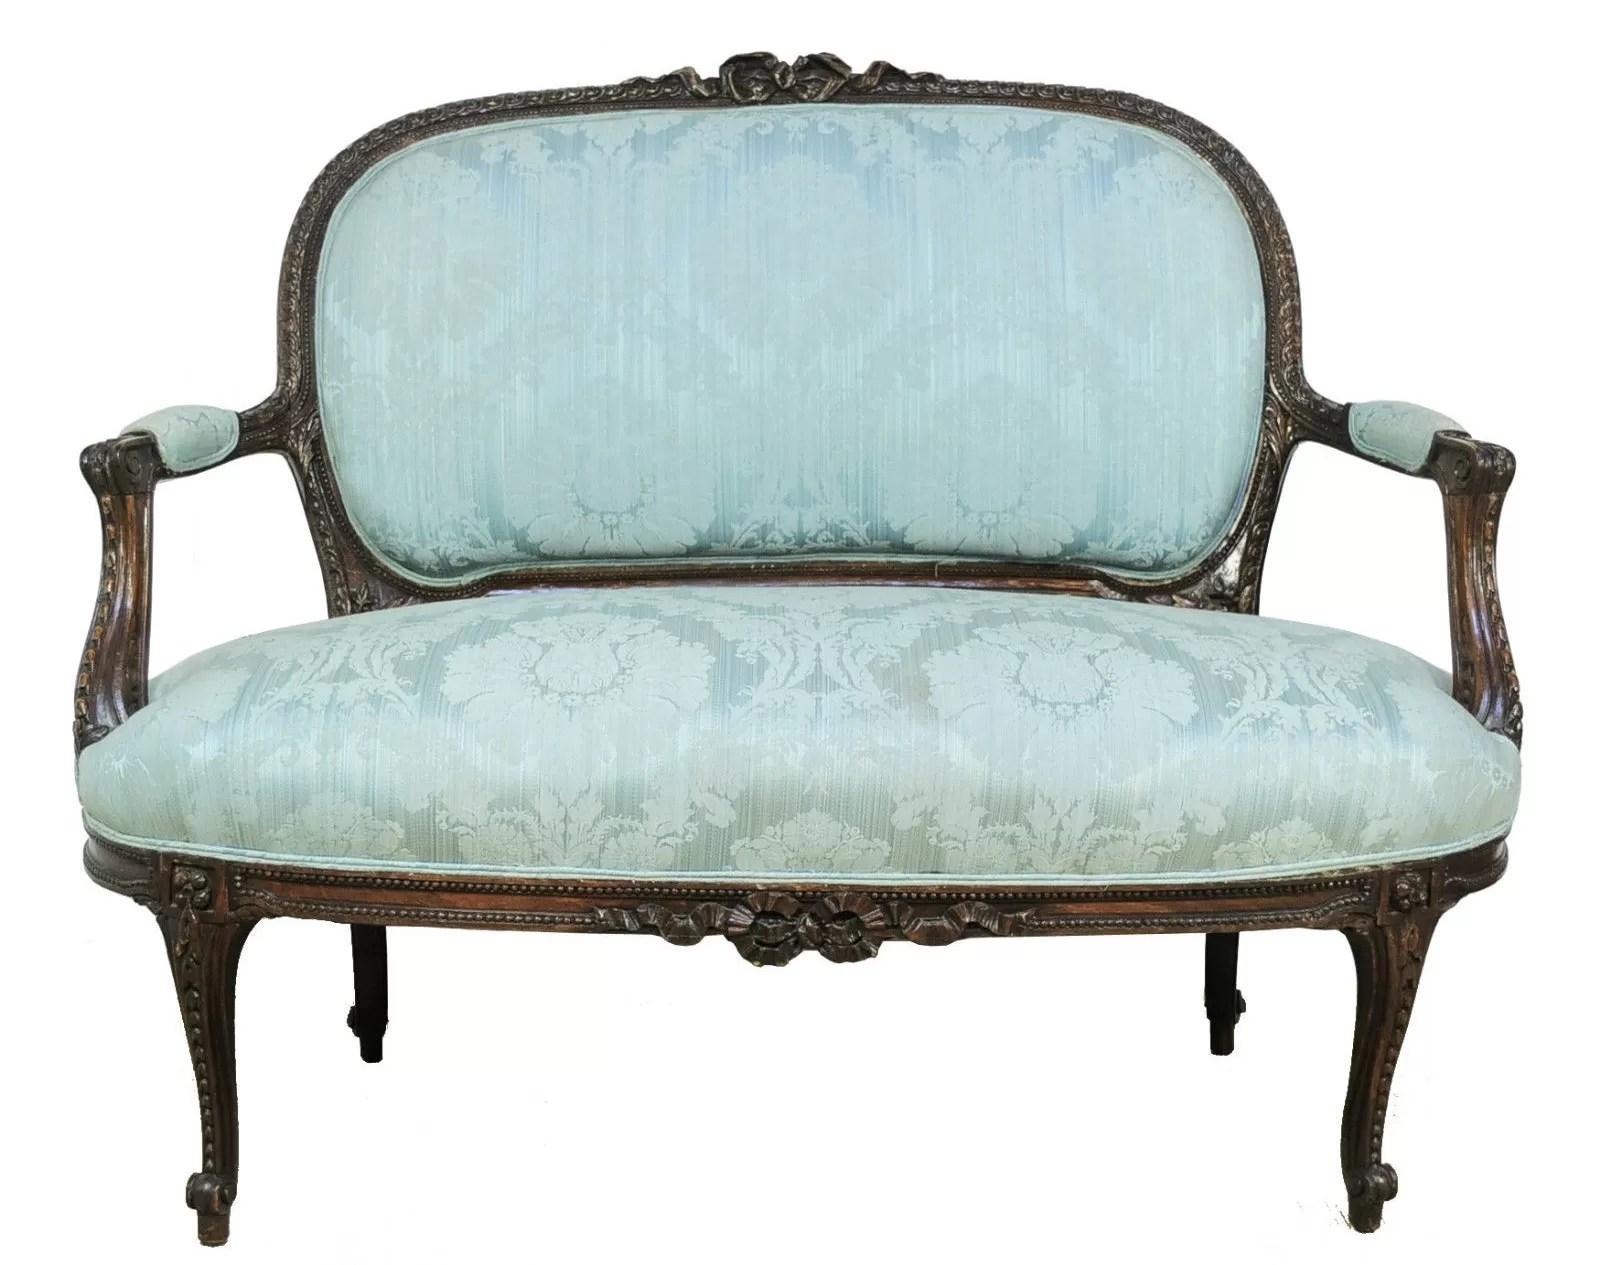 antique french sofa ebay panache dog style sofas chaise longue ornate gold leaf